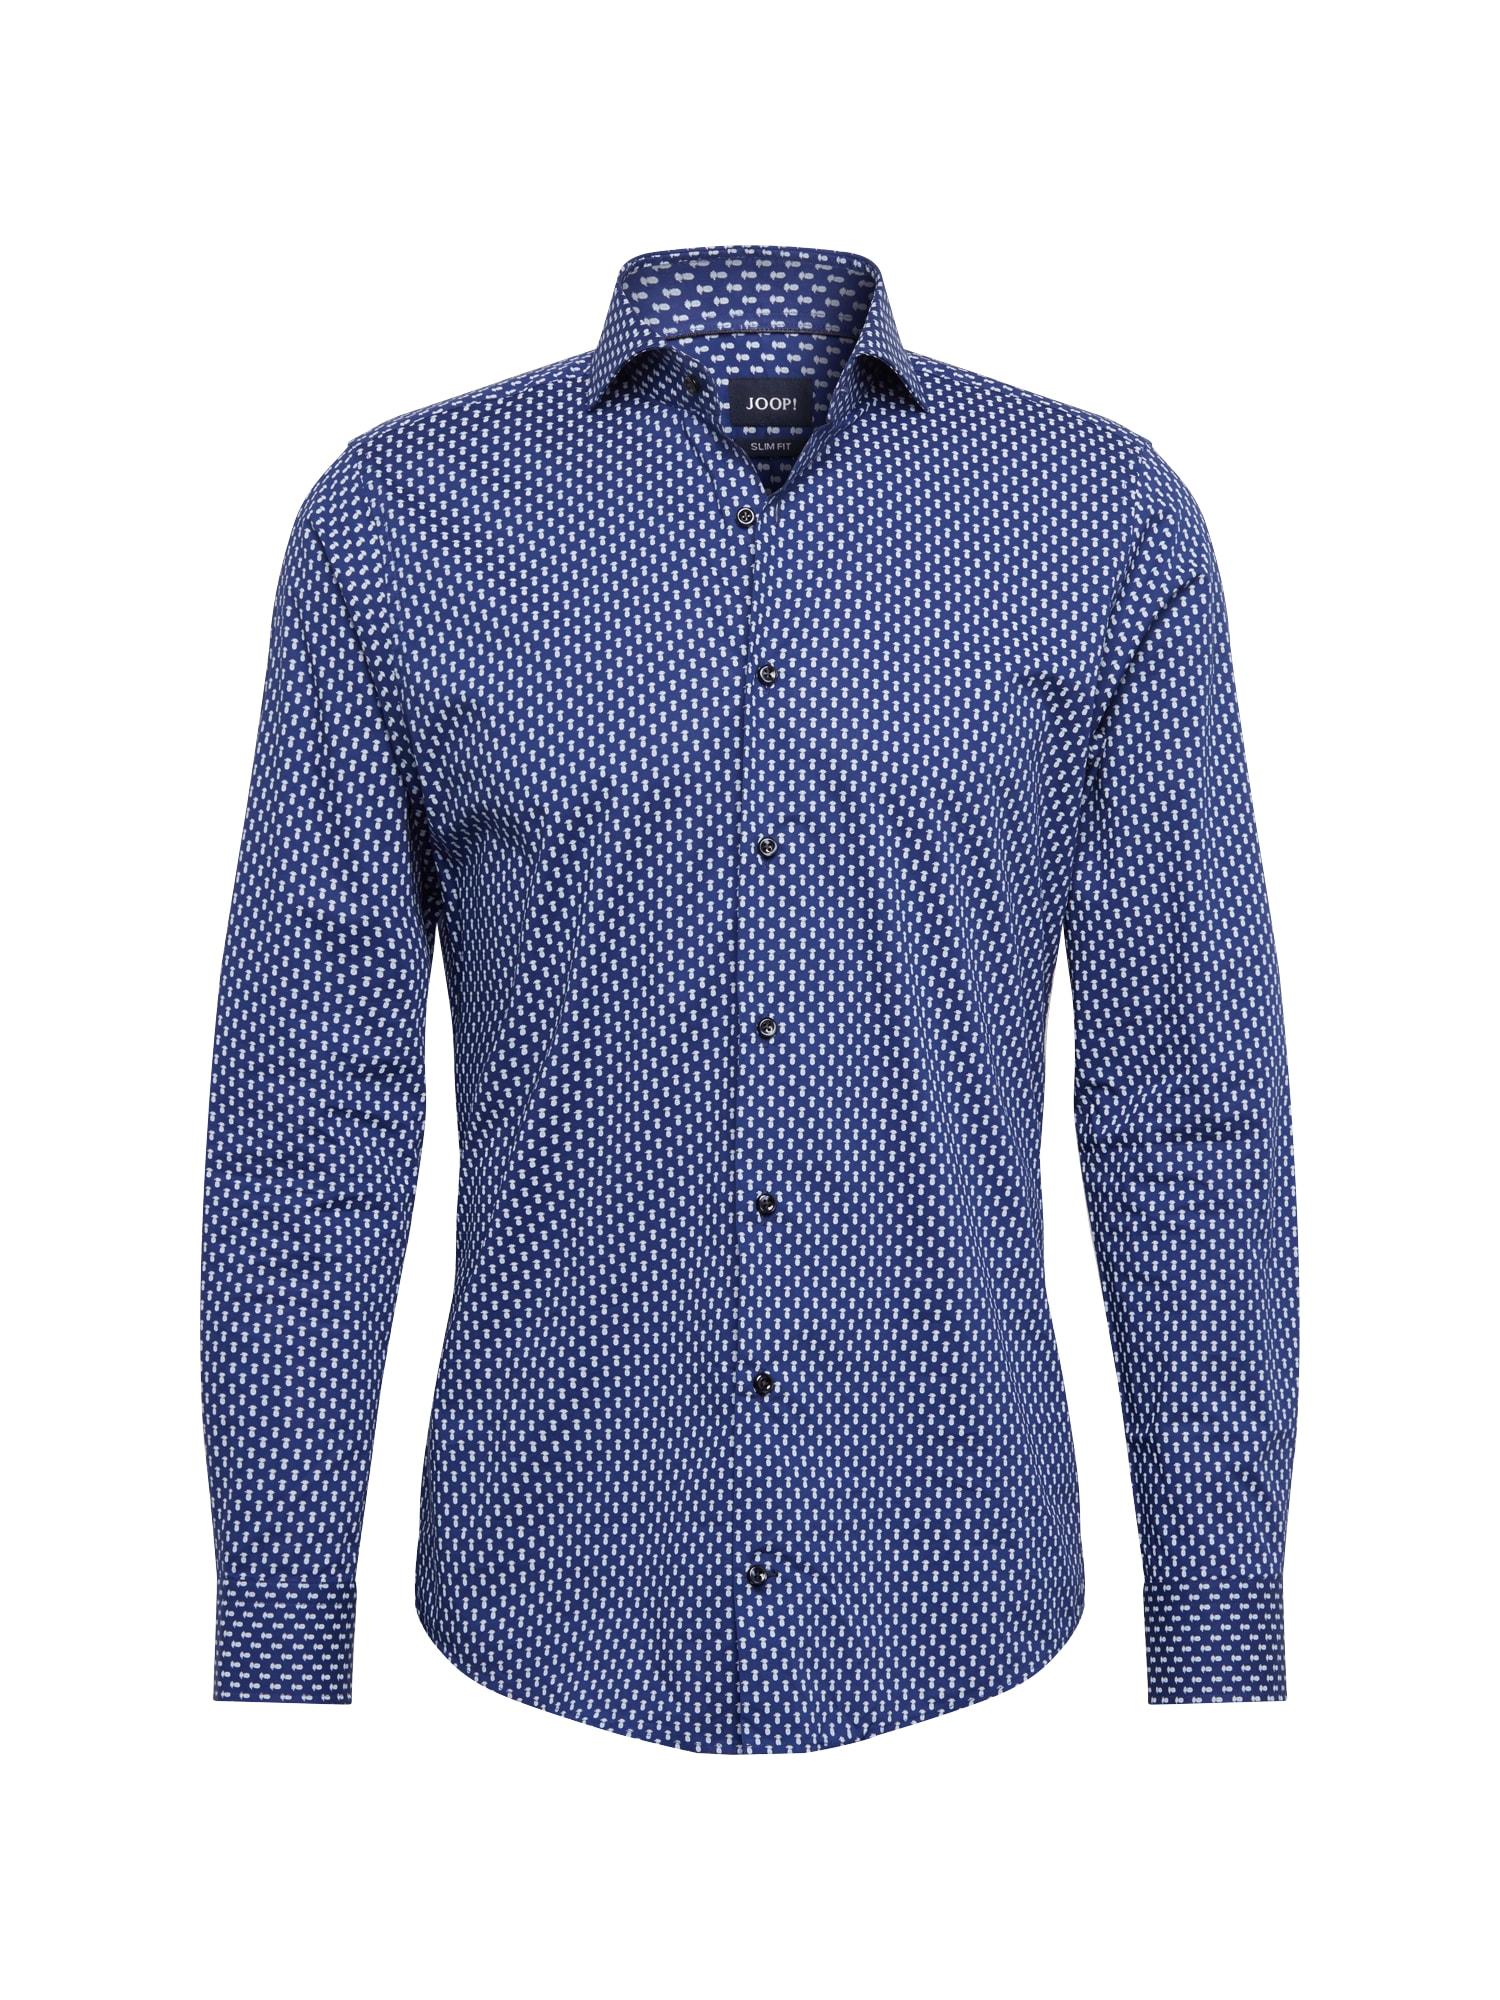 Košile Pajos tmavě modrá bílá JOOP!